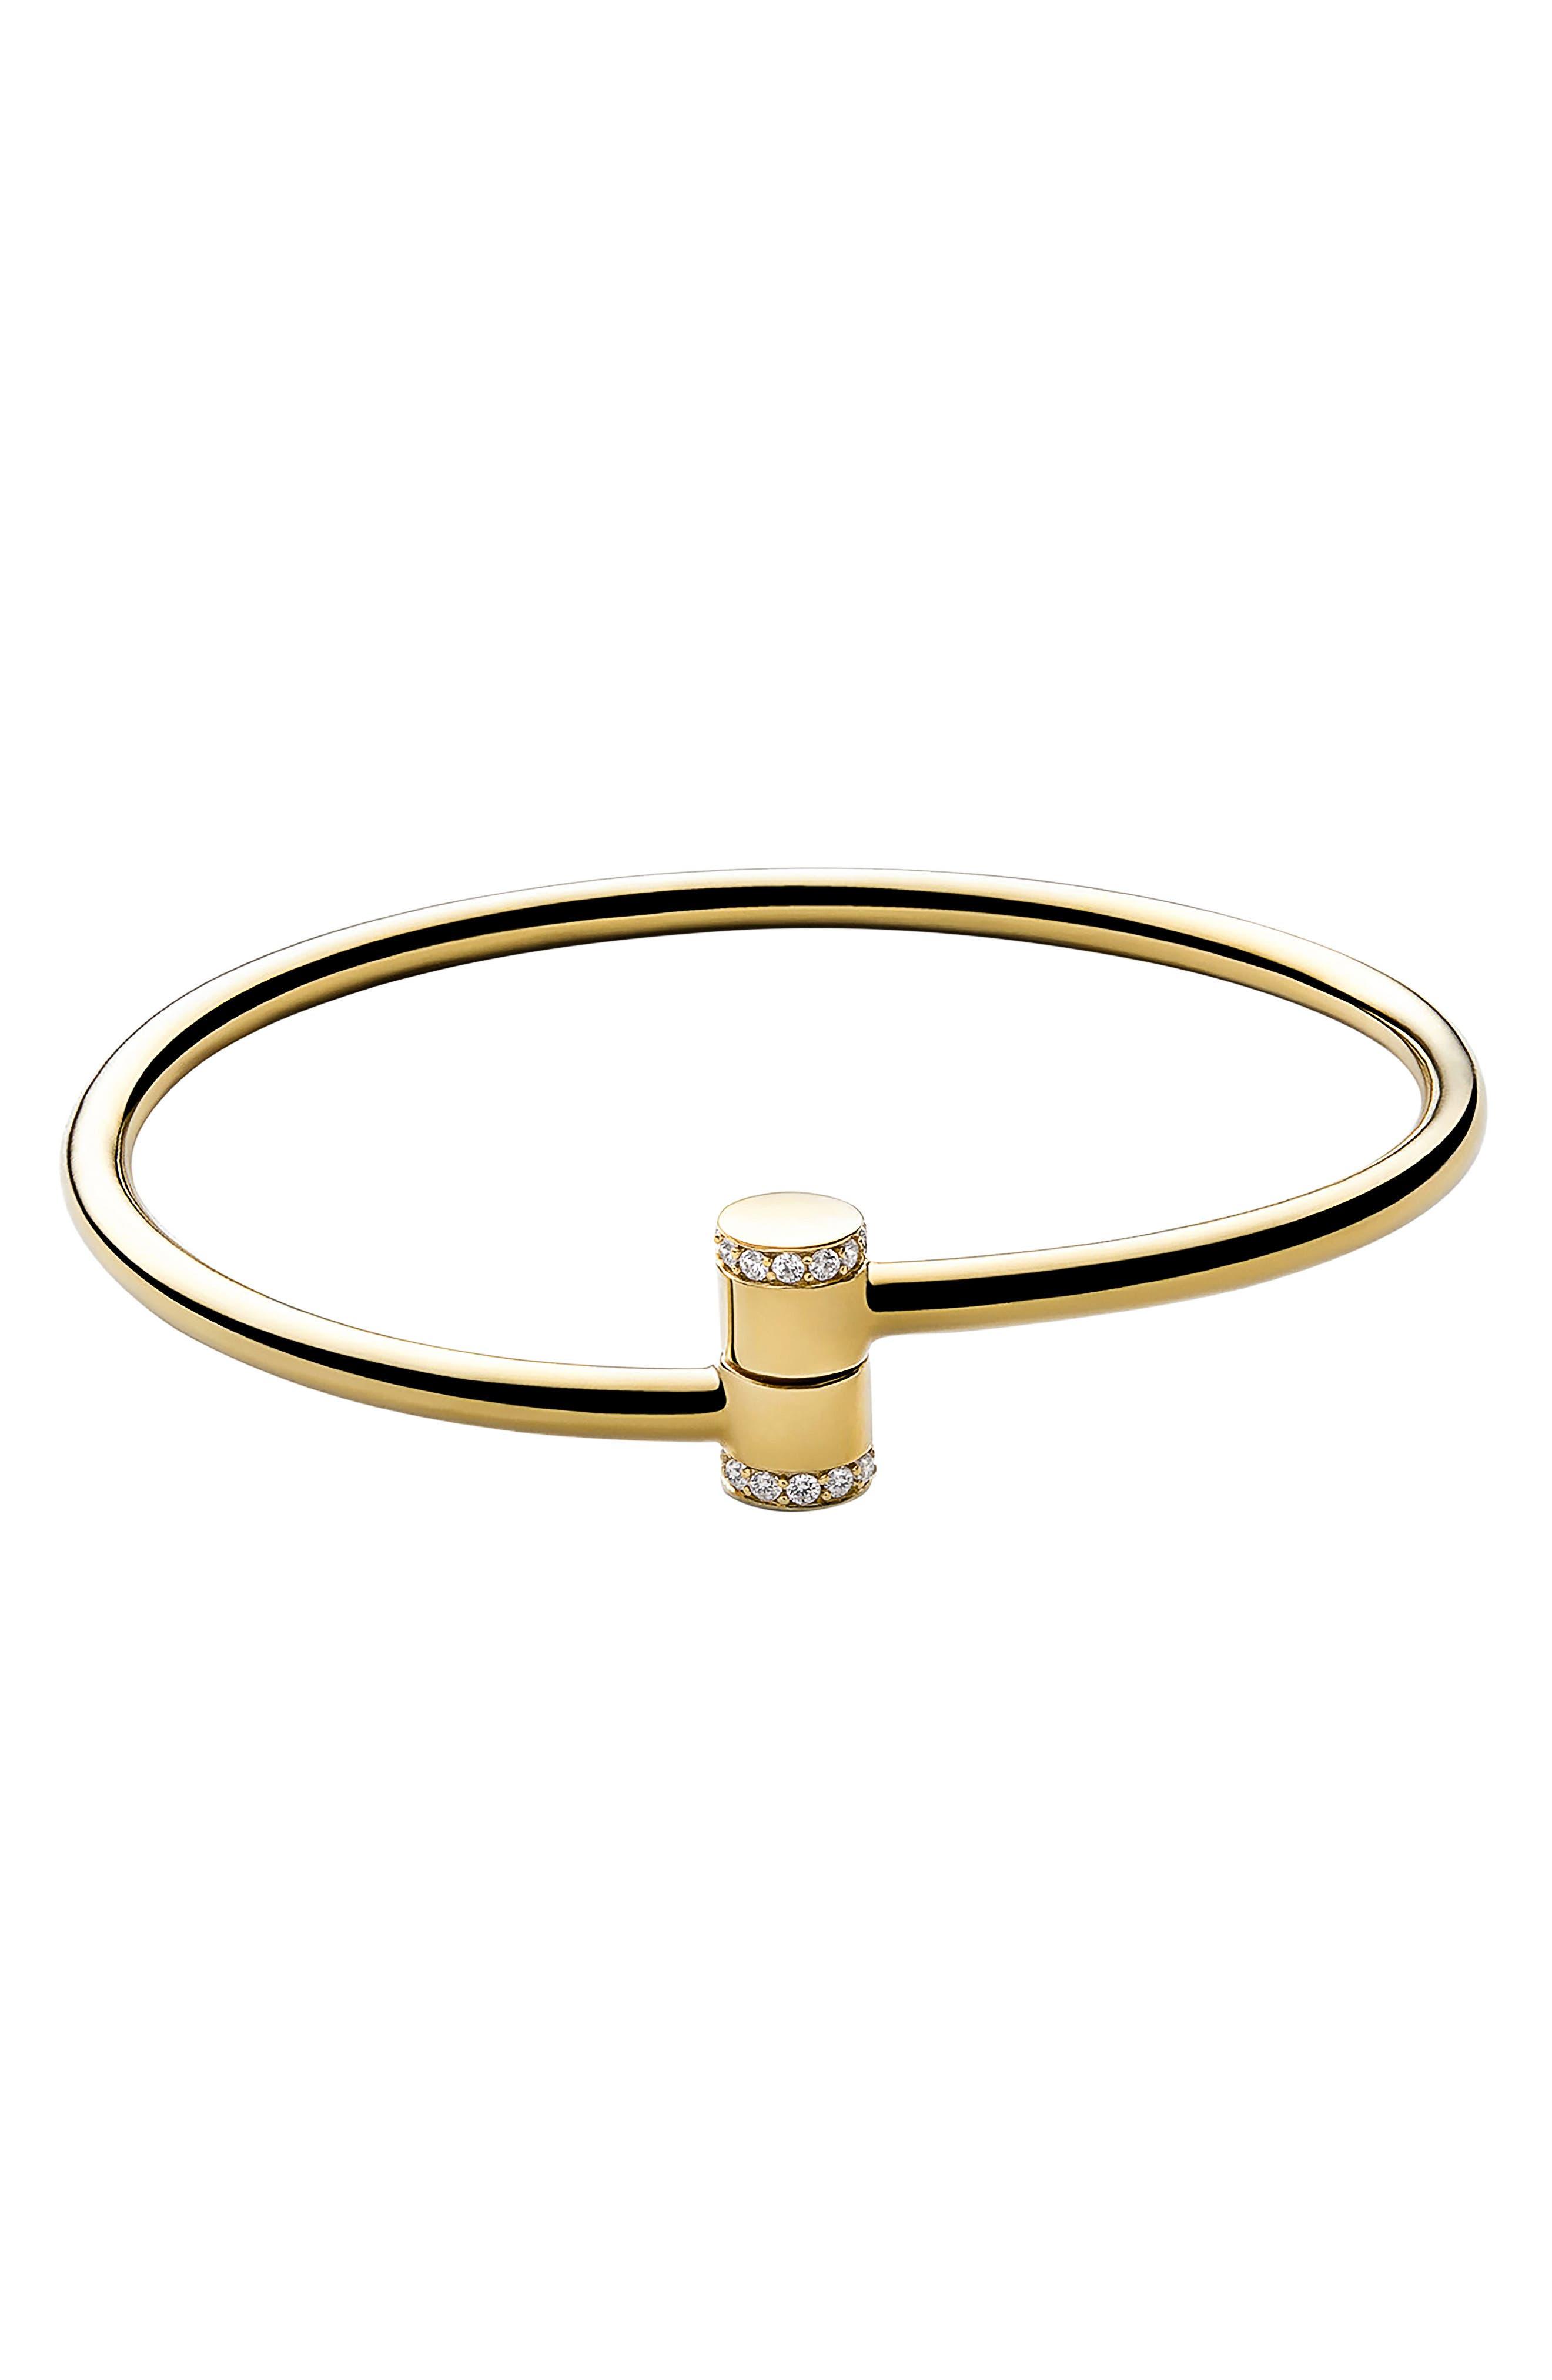 White Sapphire Pillar Cuff Bracelet,                         Main,                         color, POLISHED GOLD/ WHITE SAPPHIRE